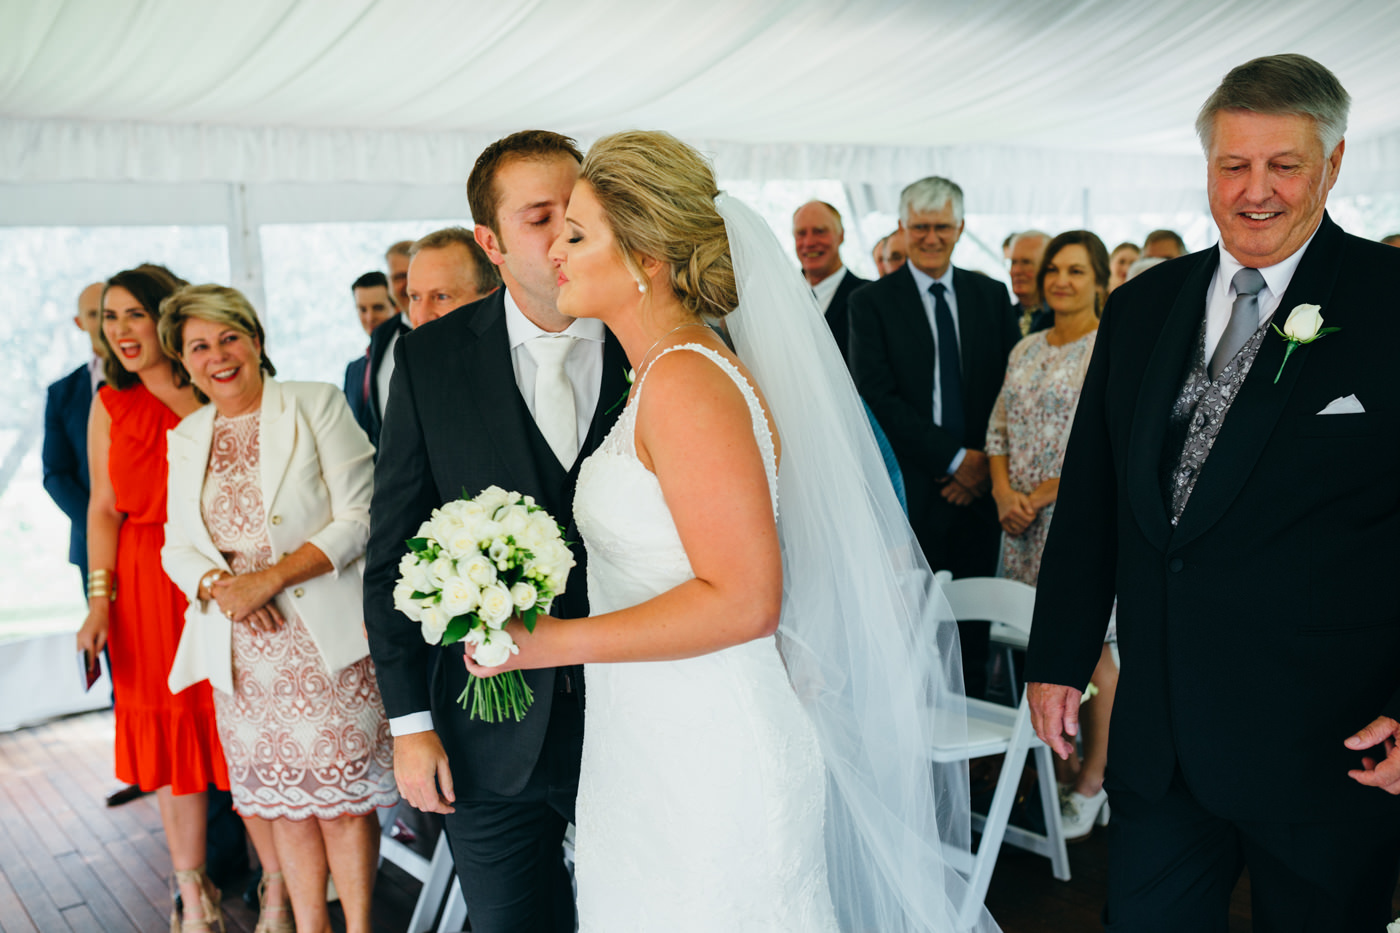 bracu_wedding_photos1034.jpg